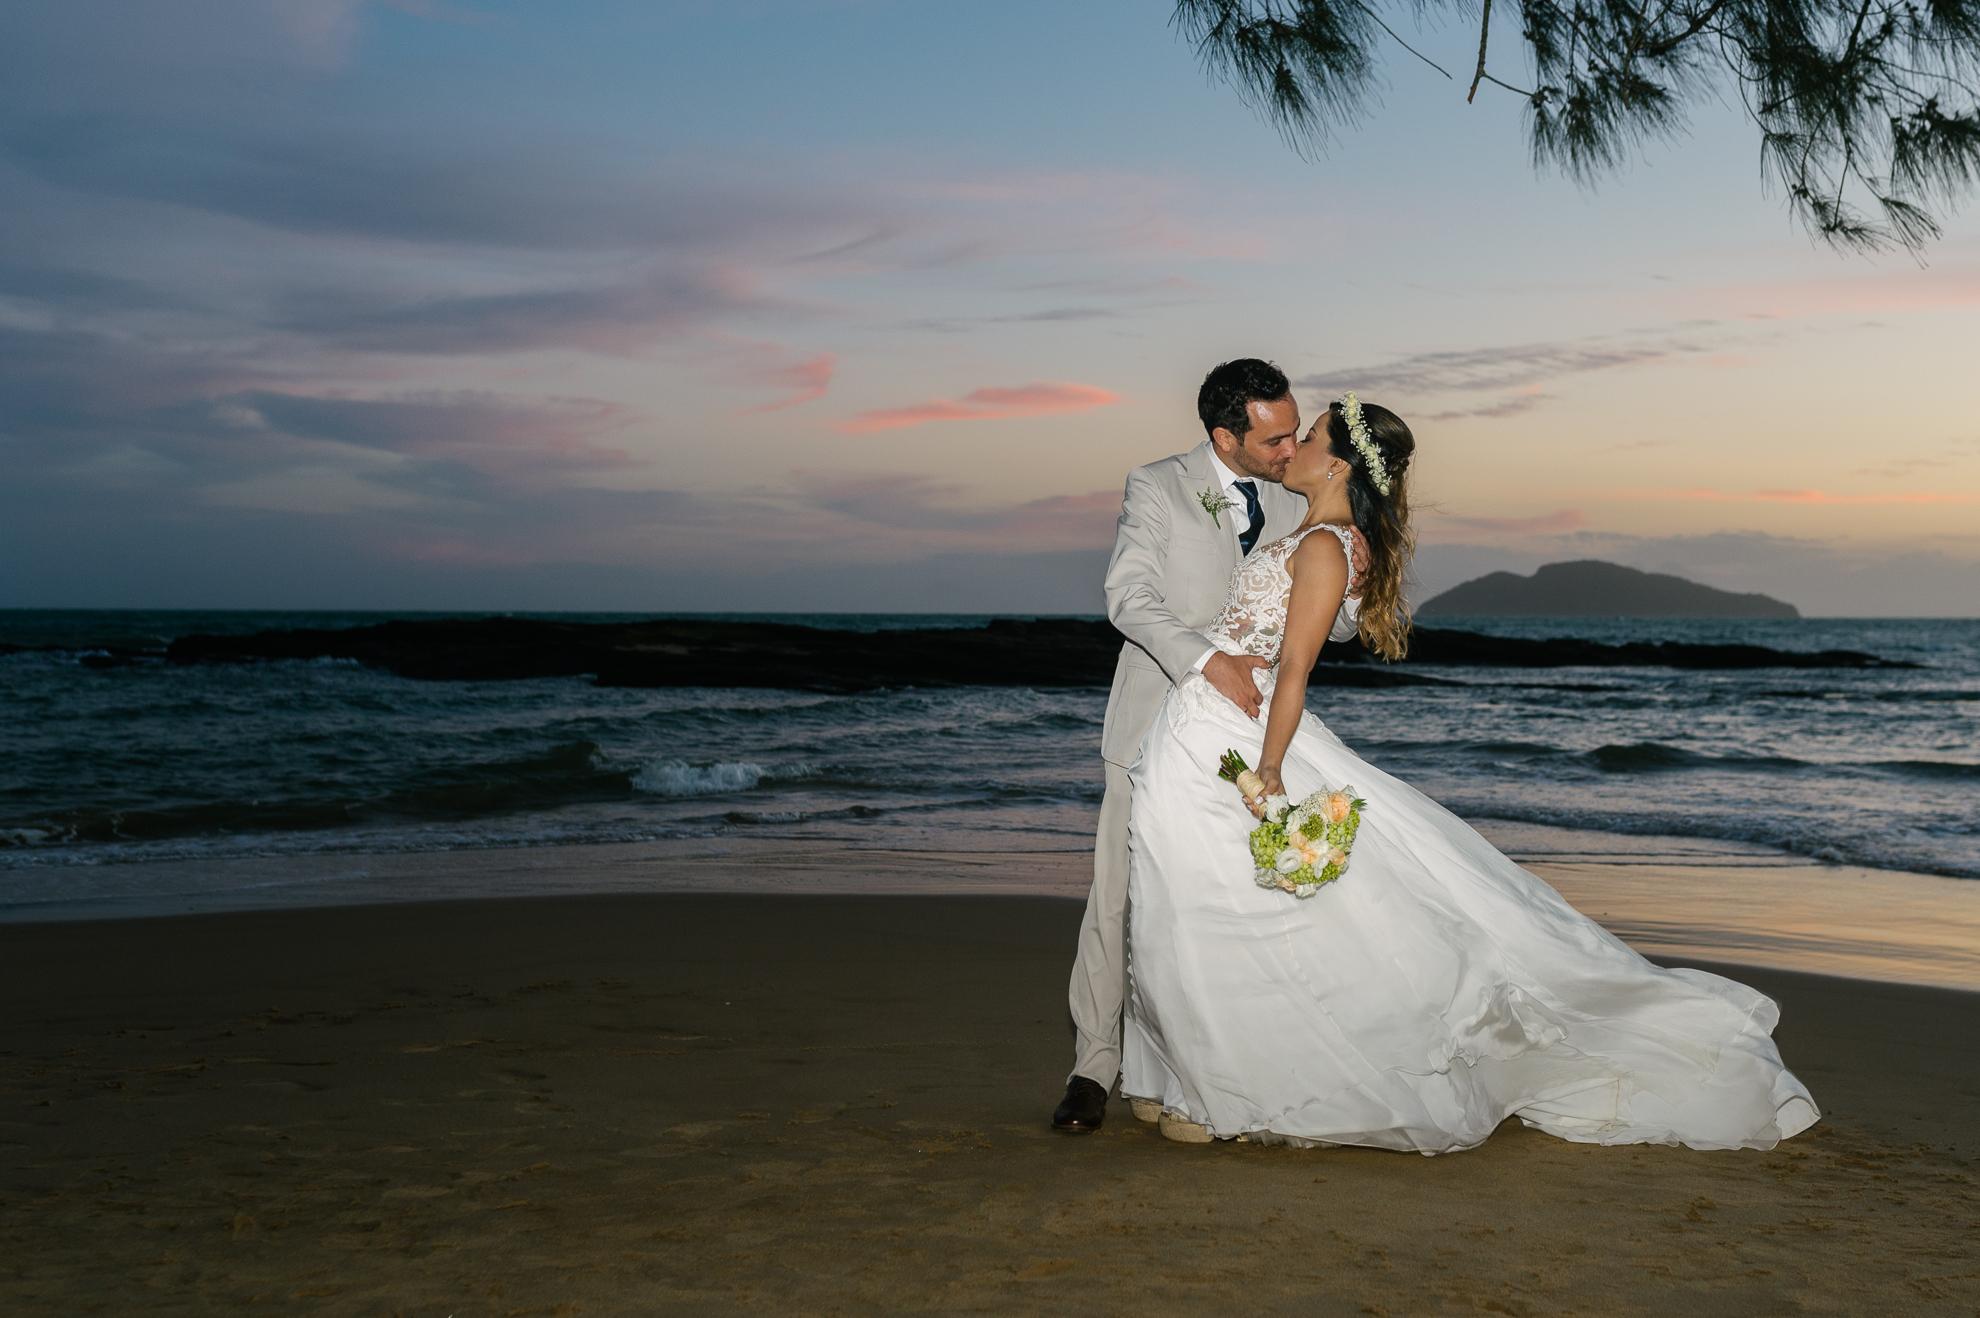 Pousada Praia da Tartaruga - Priscila & Guilherme (84)